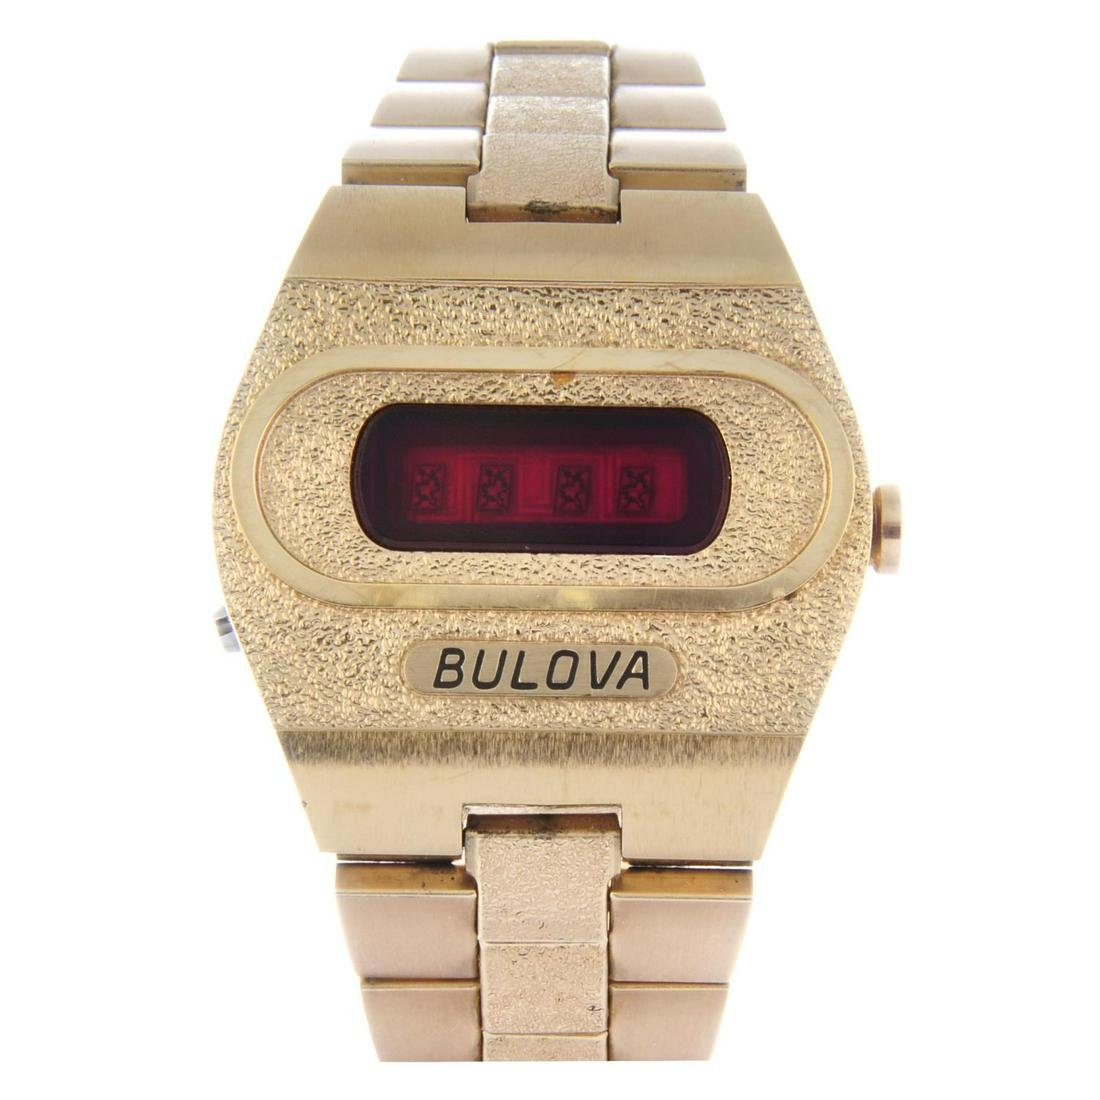 BULOVA - a gentleman's Accuquartz bracelet watch. Gold